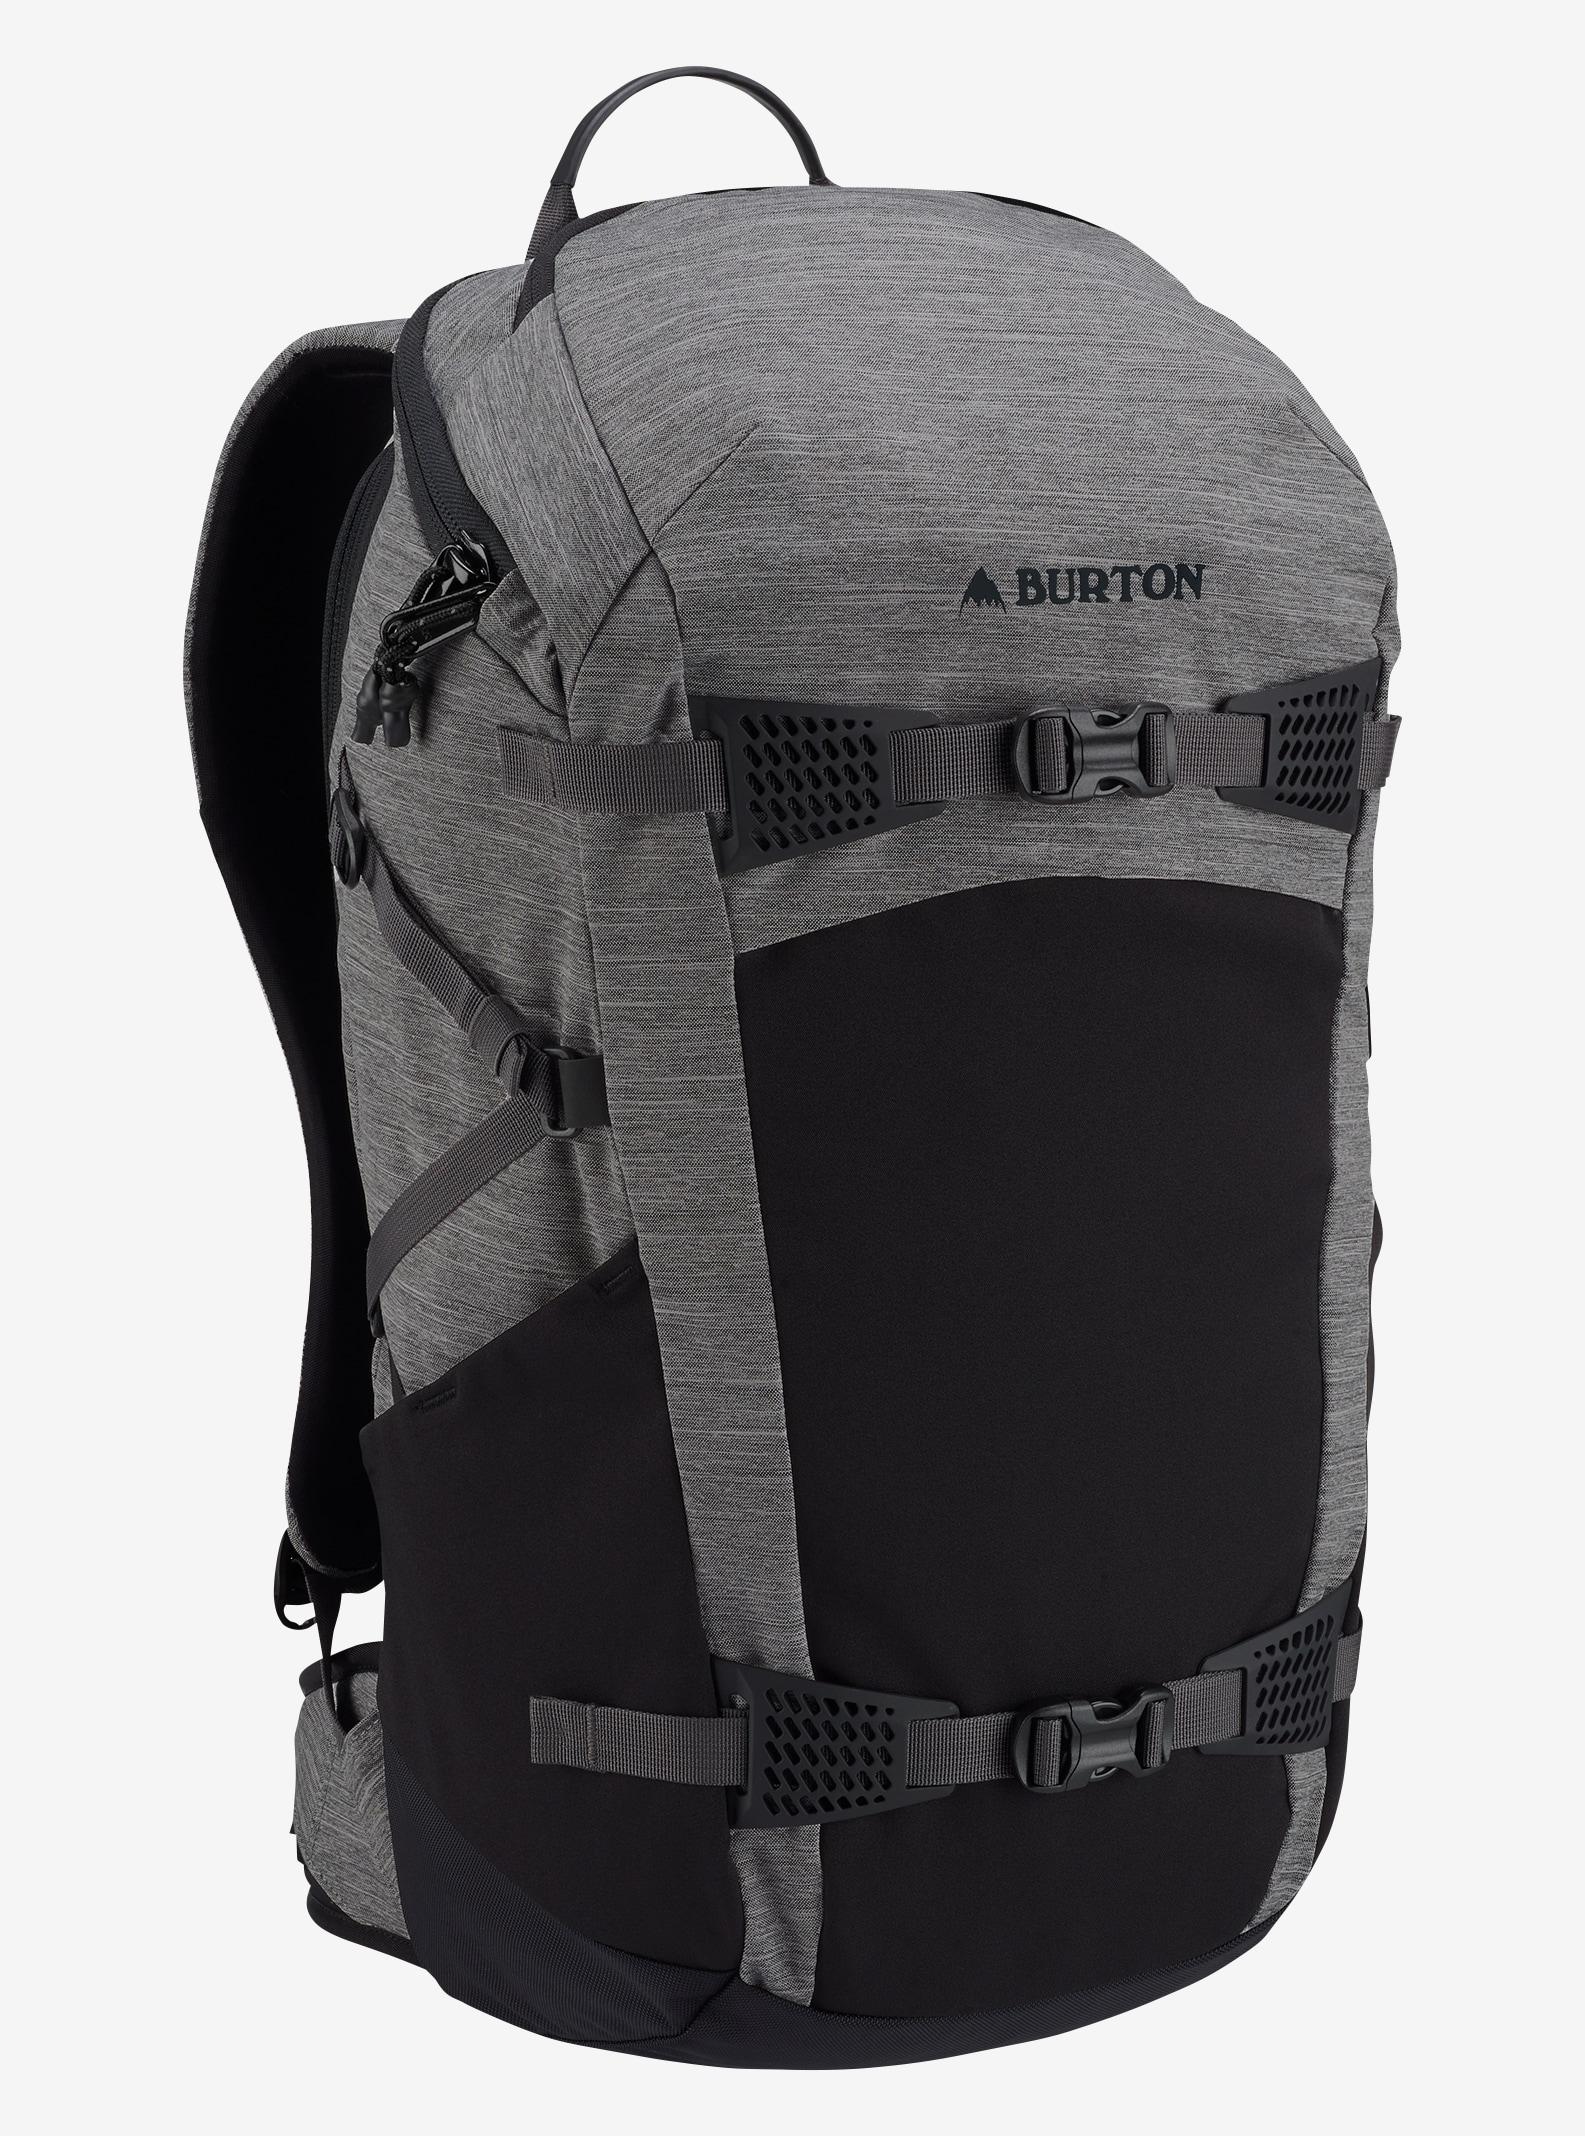 Sac à Dos Burton Snowboard Day Hiker 25L - W17 8bAht1